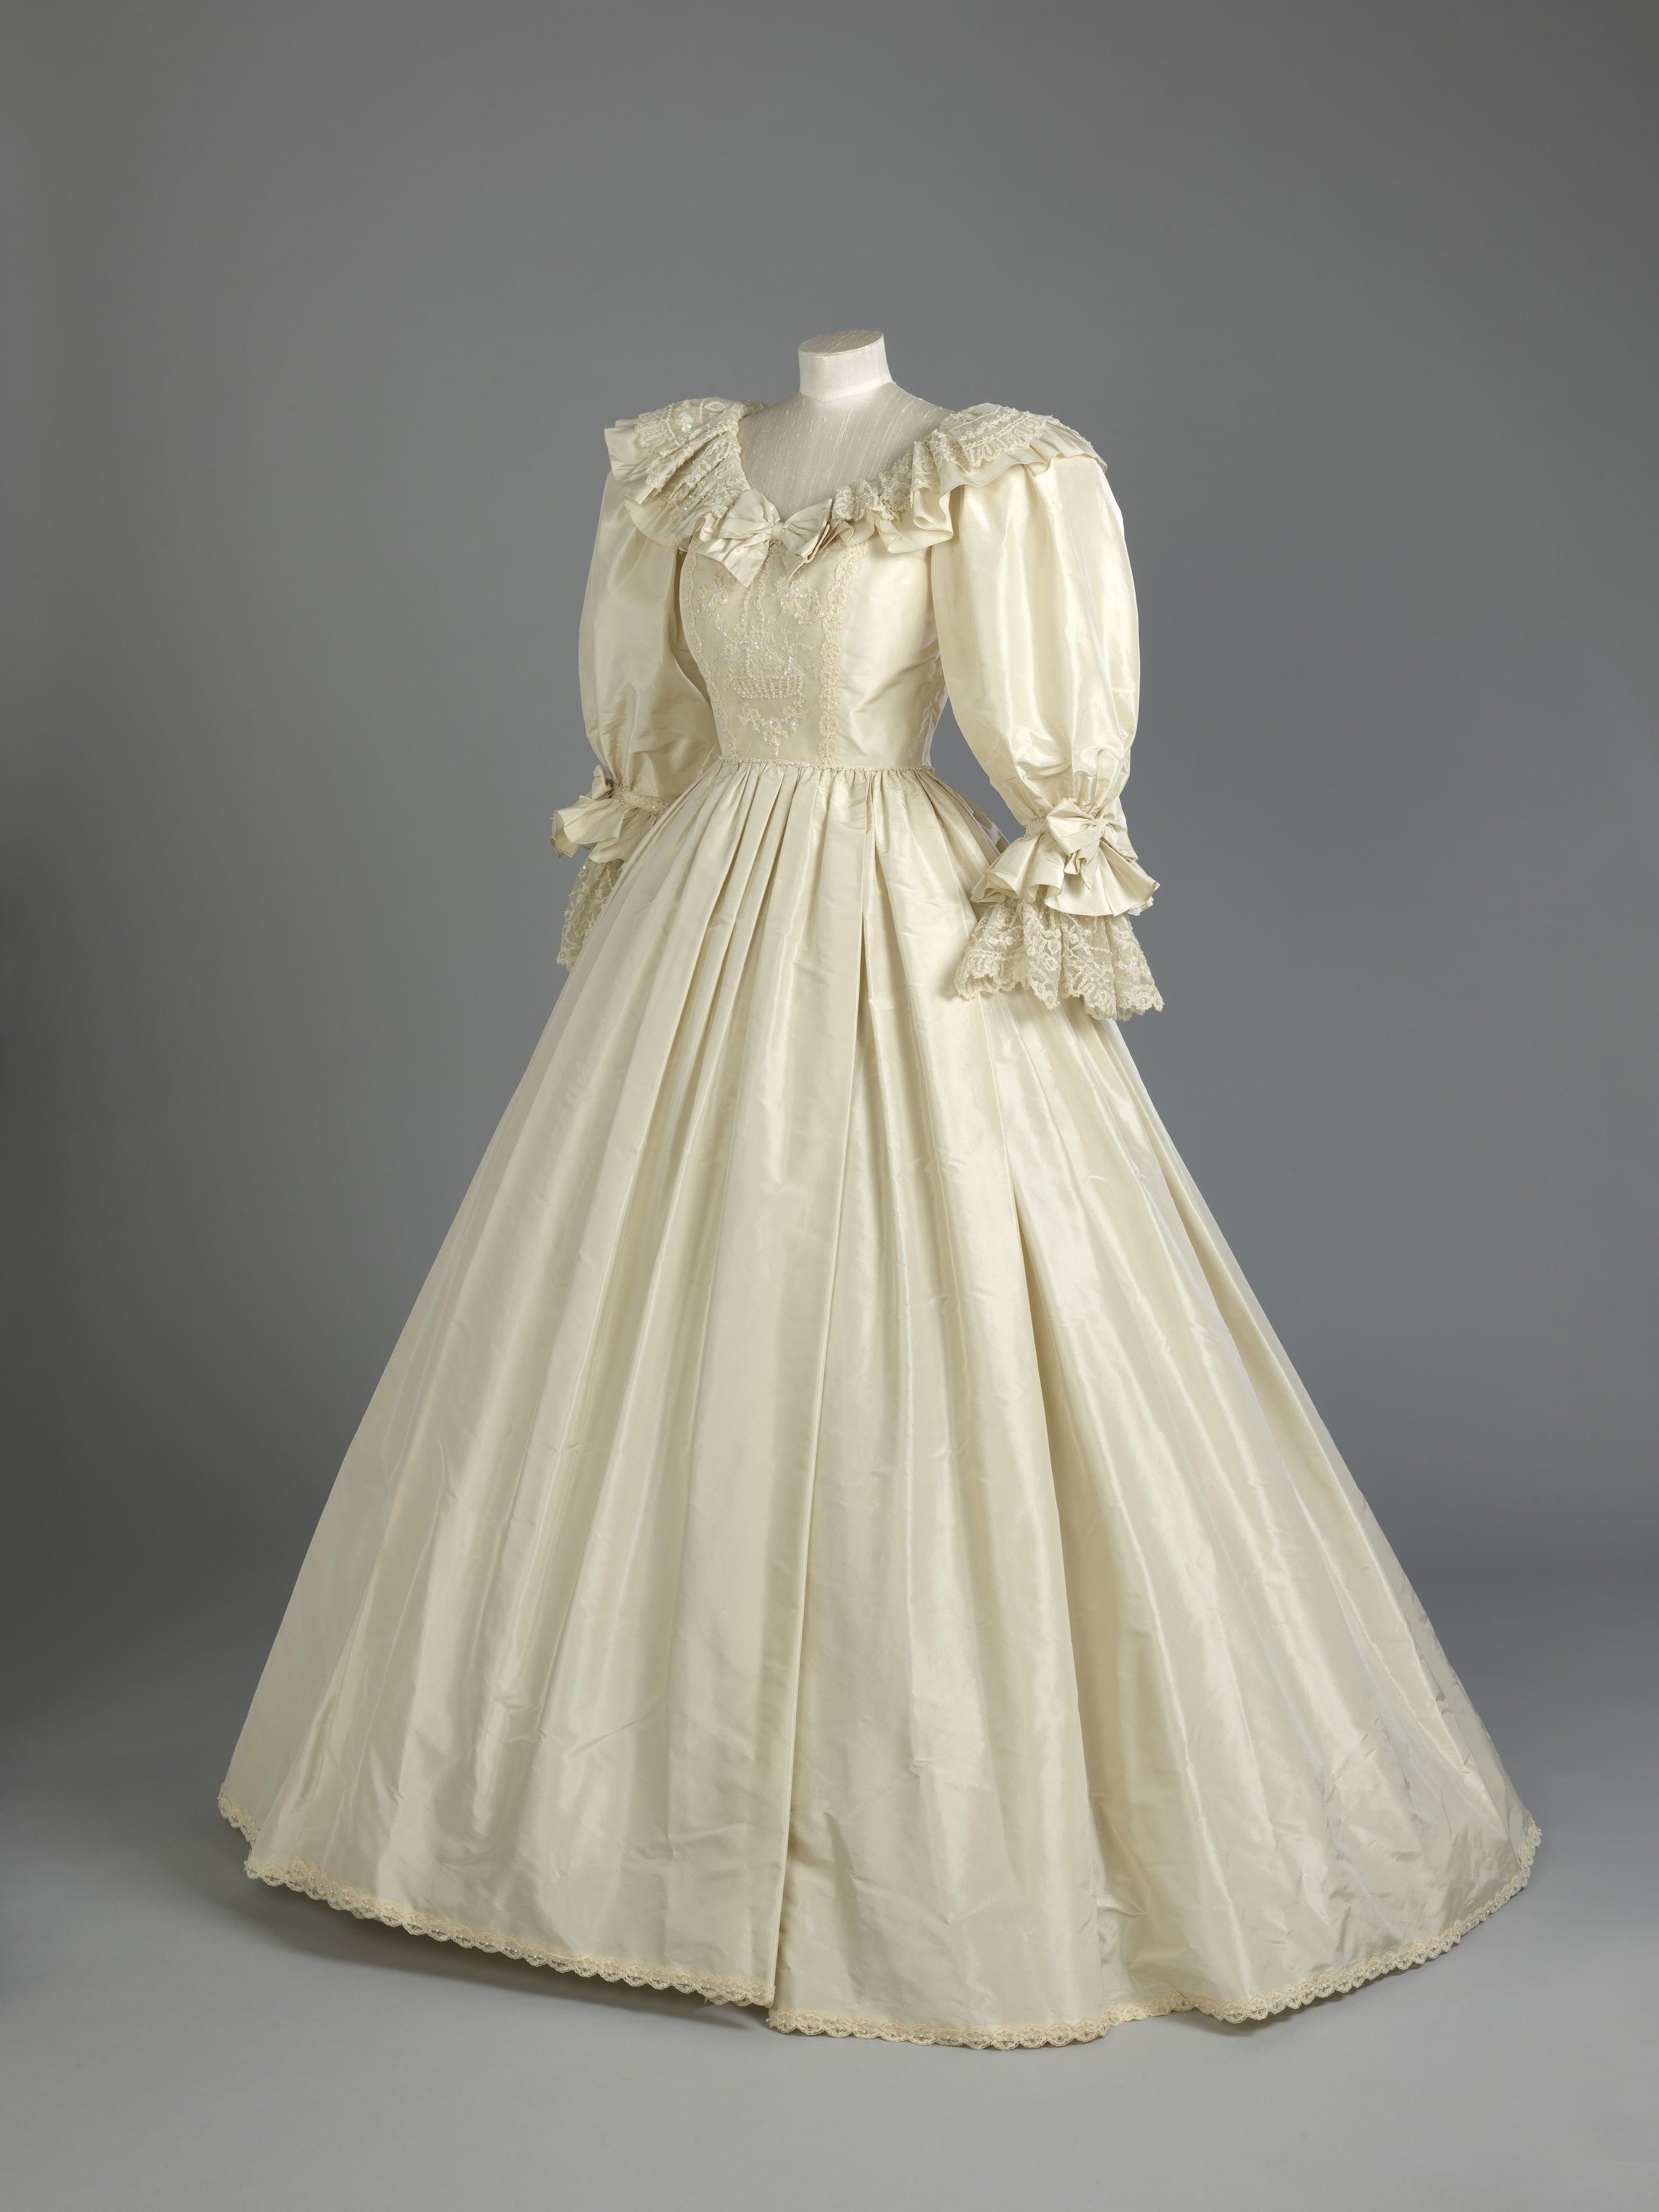 Full length photograph of the dress